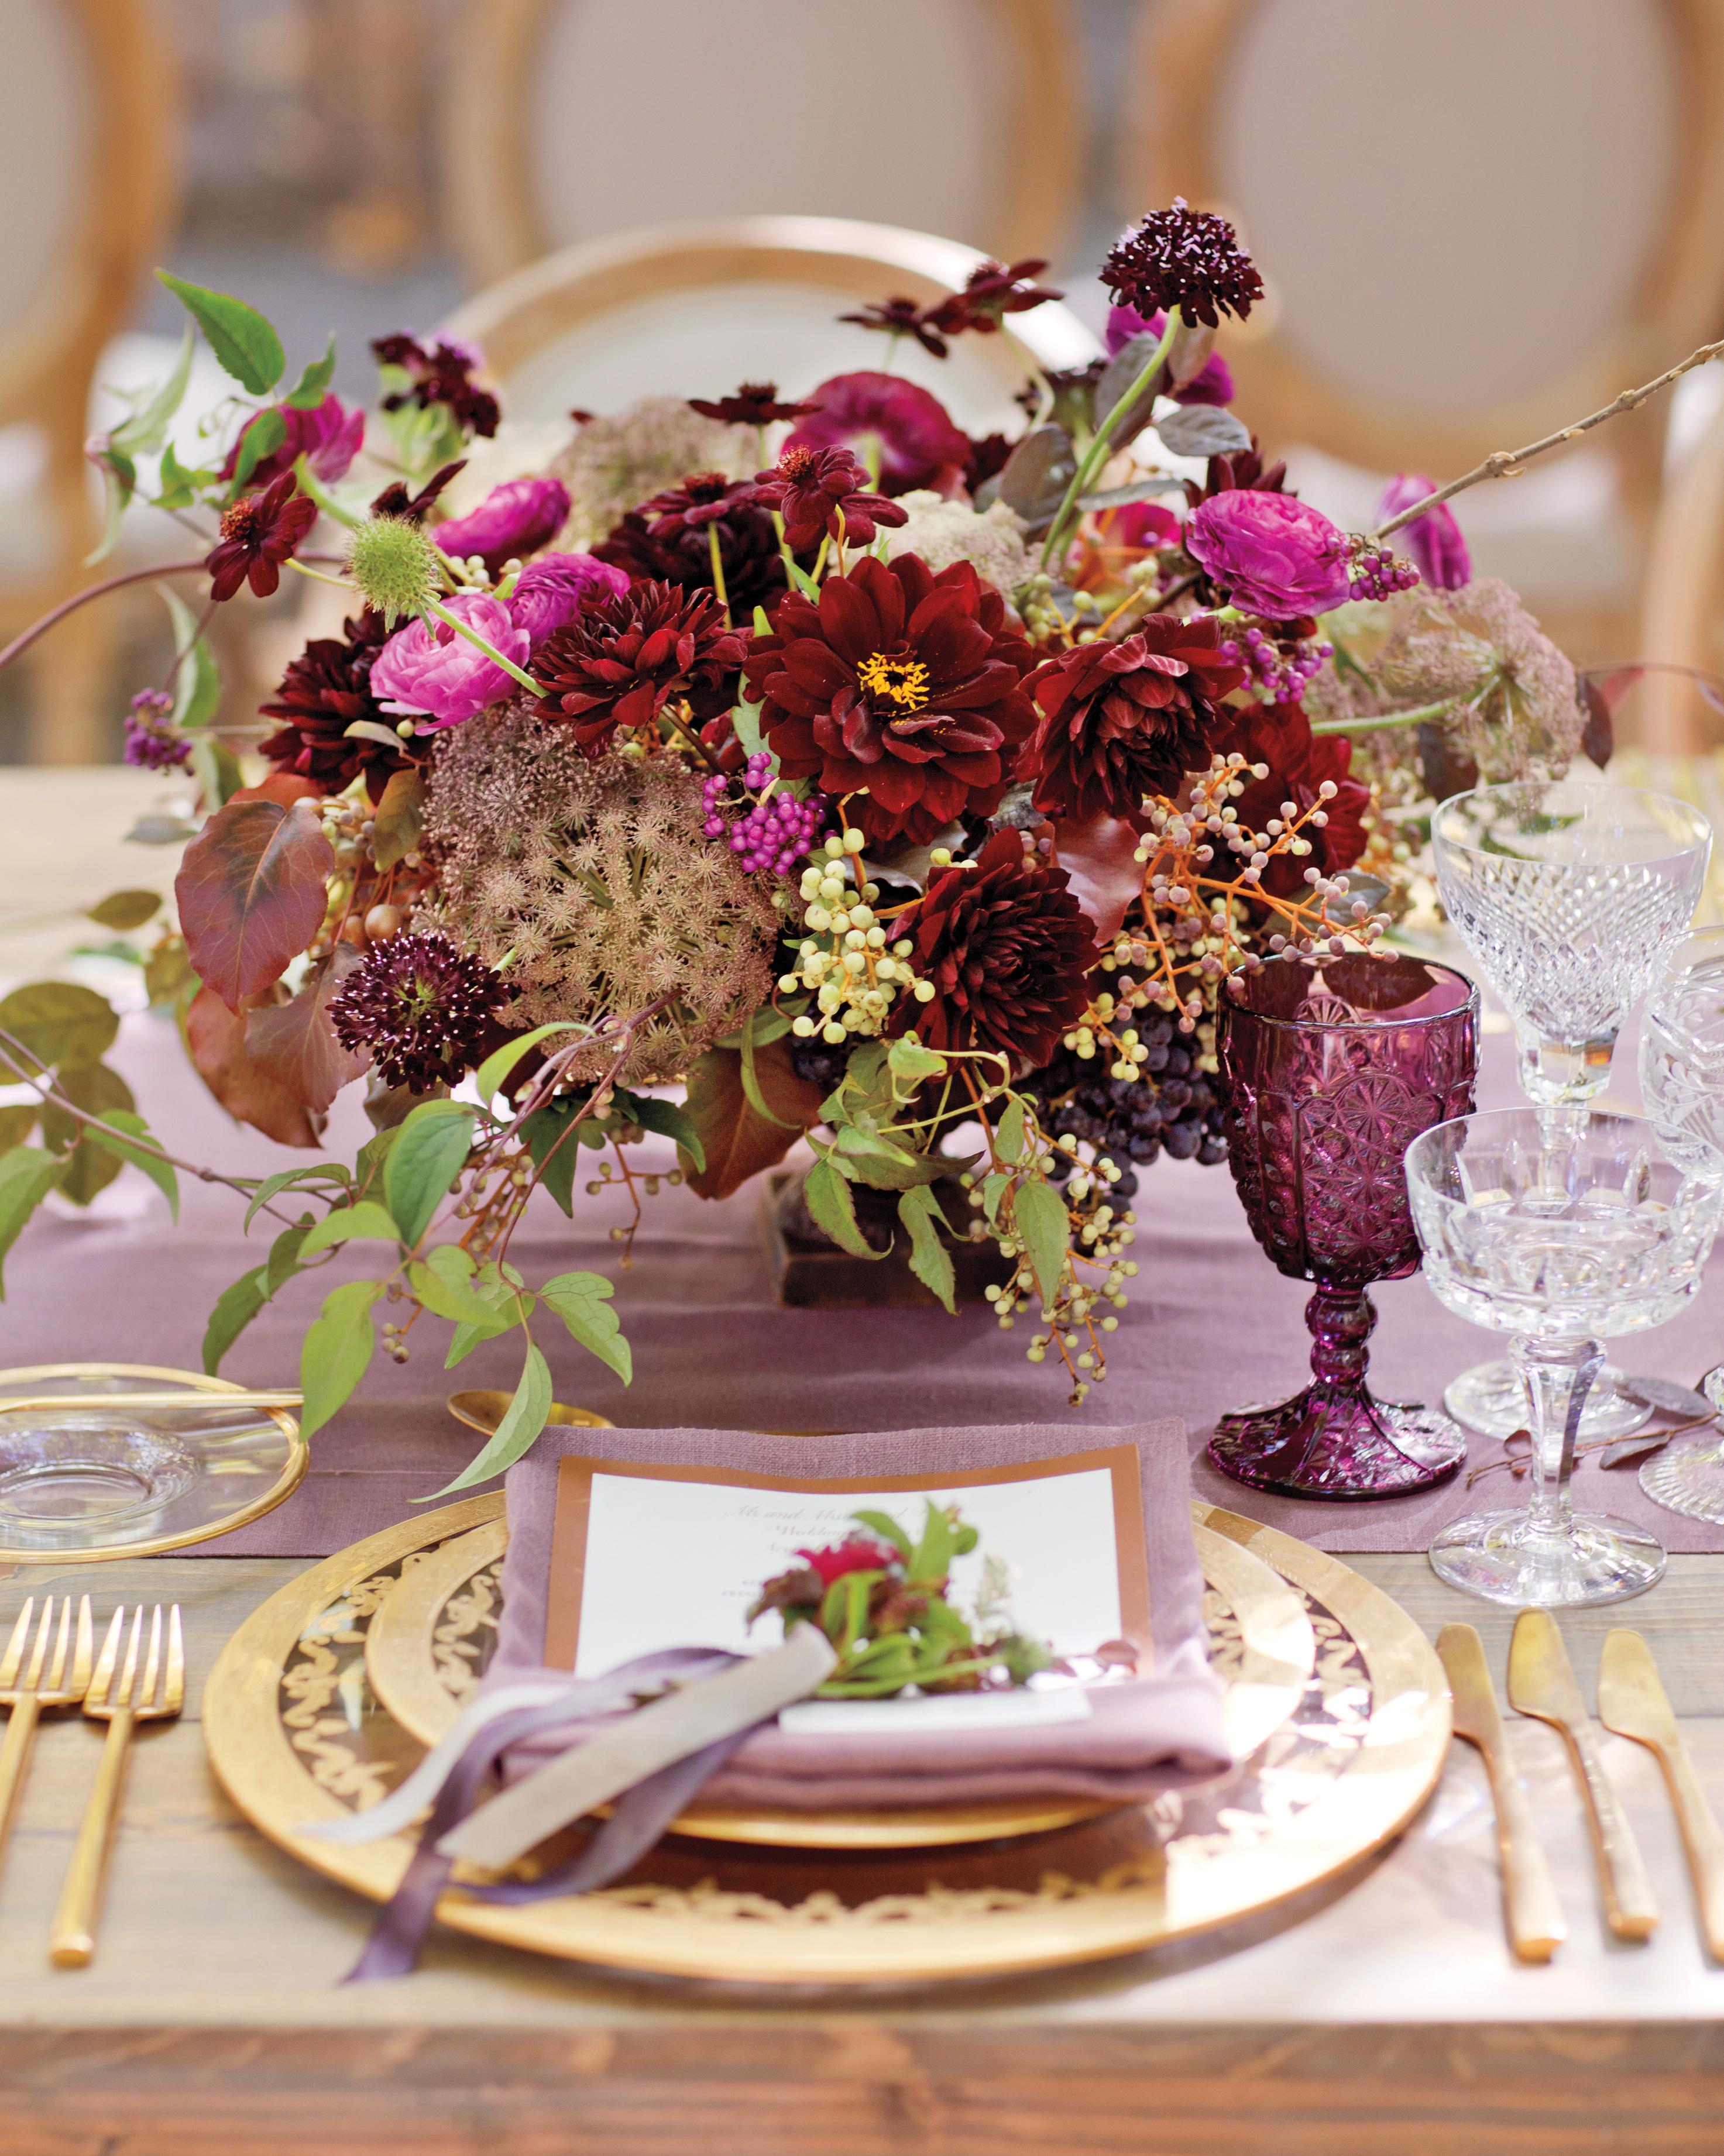 nicole-bradley-napa-california-wedding-0026-s112349.jpg